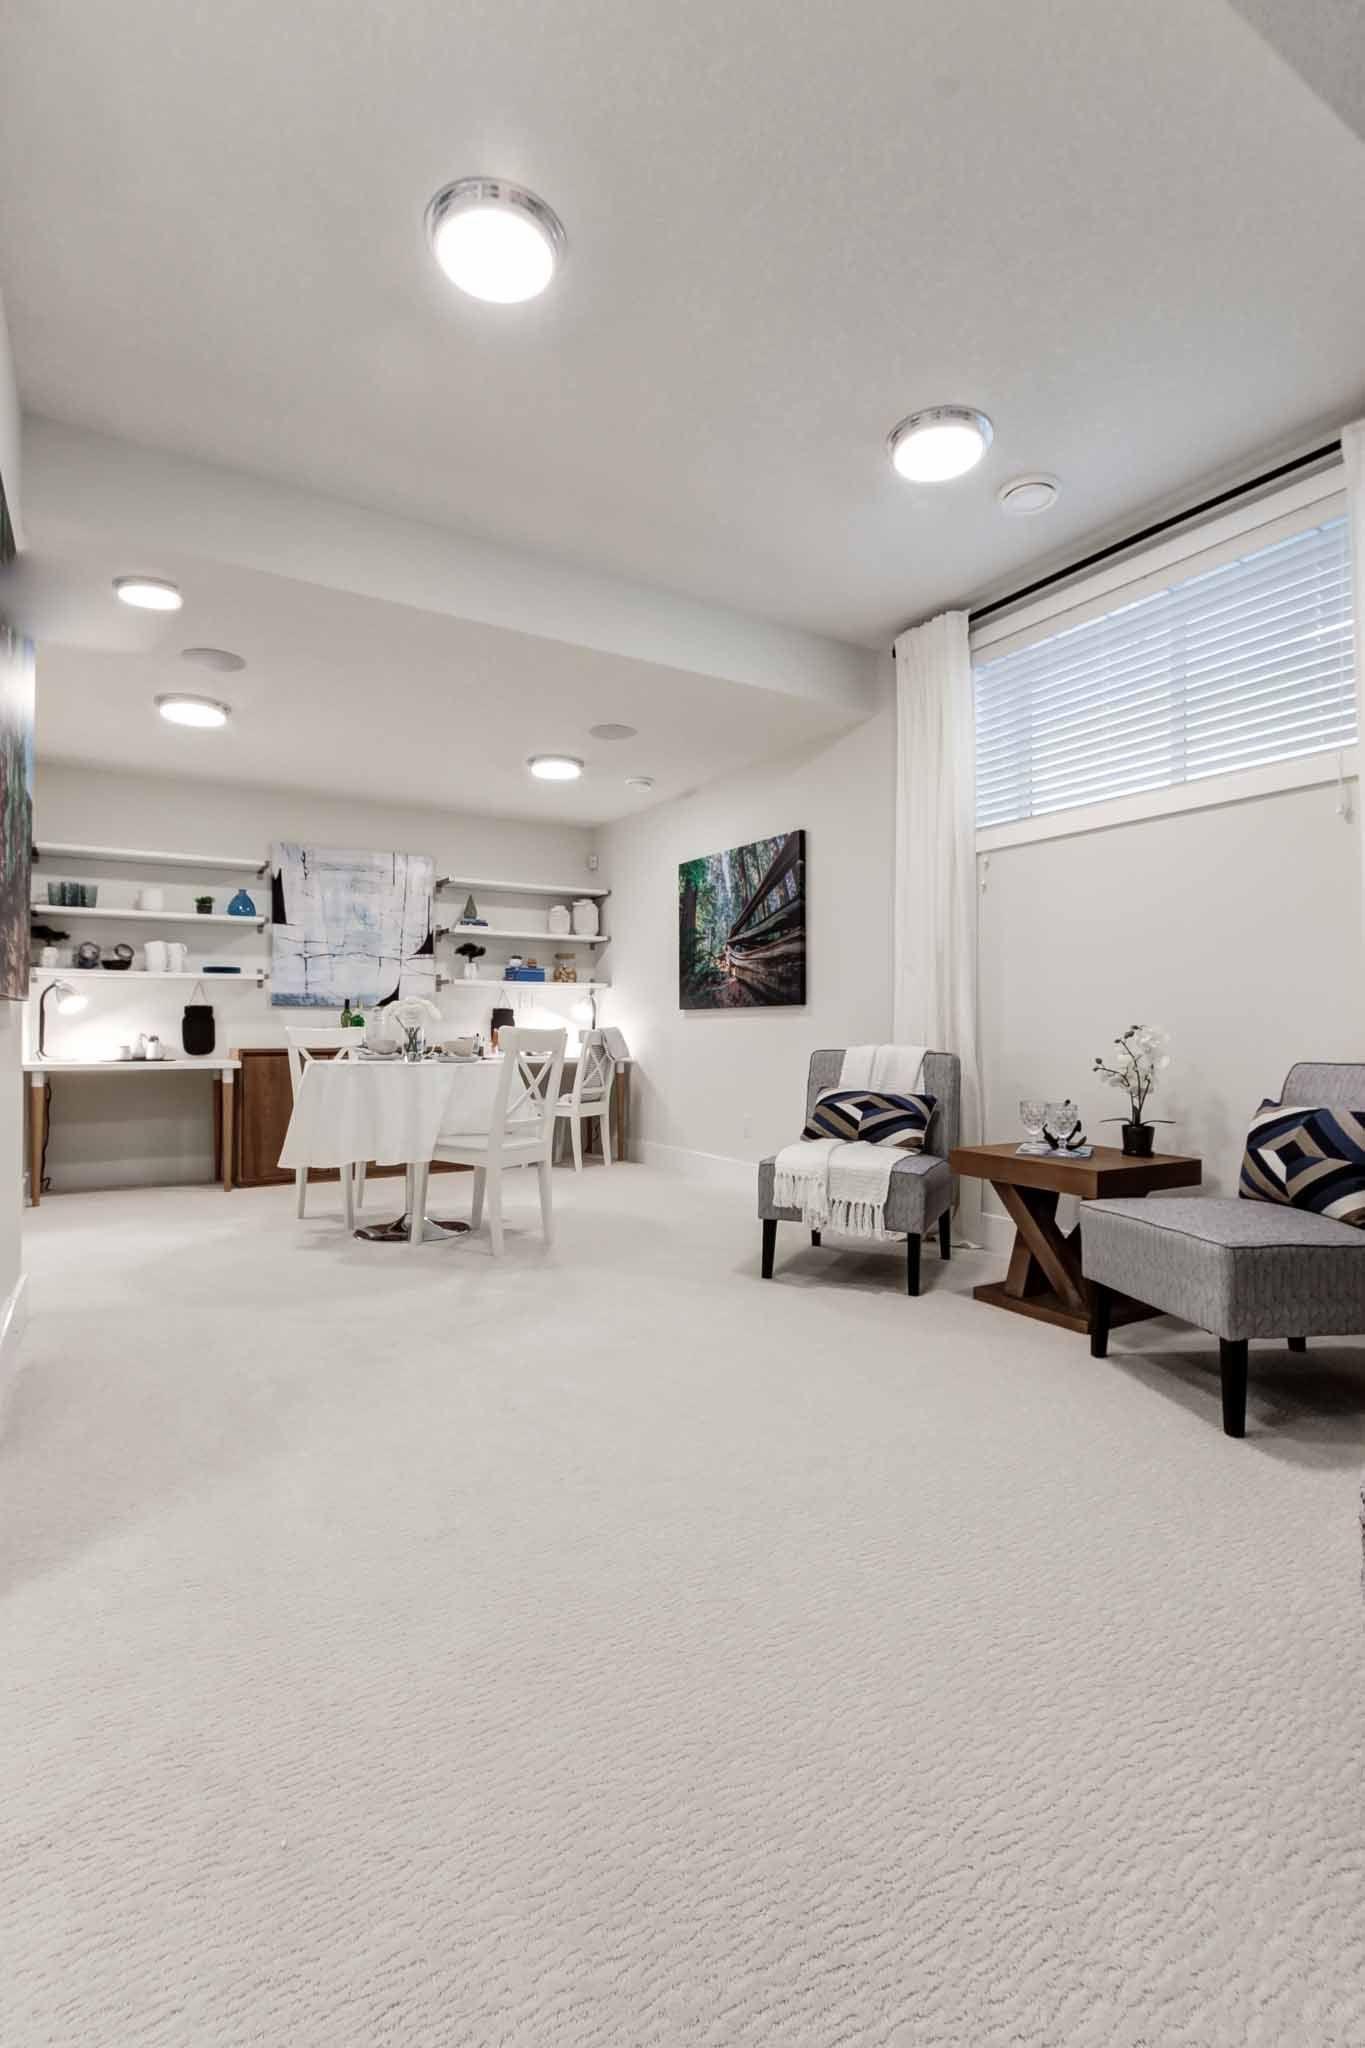 Show home in Cornerstone, Calgary. Built by Truman. #yyc #homedecor ...